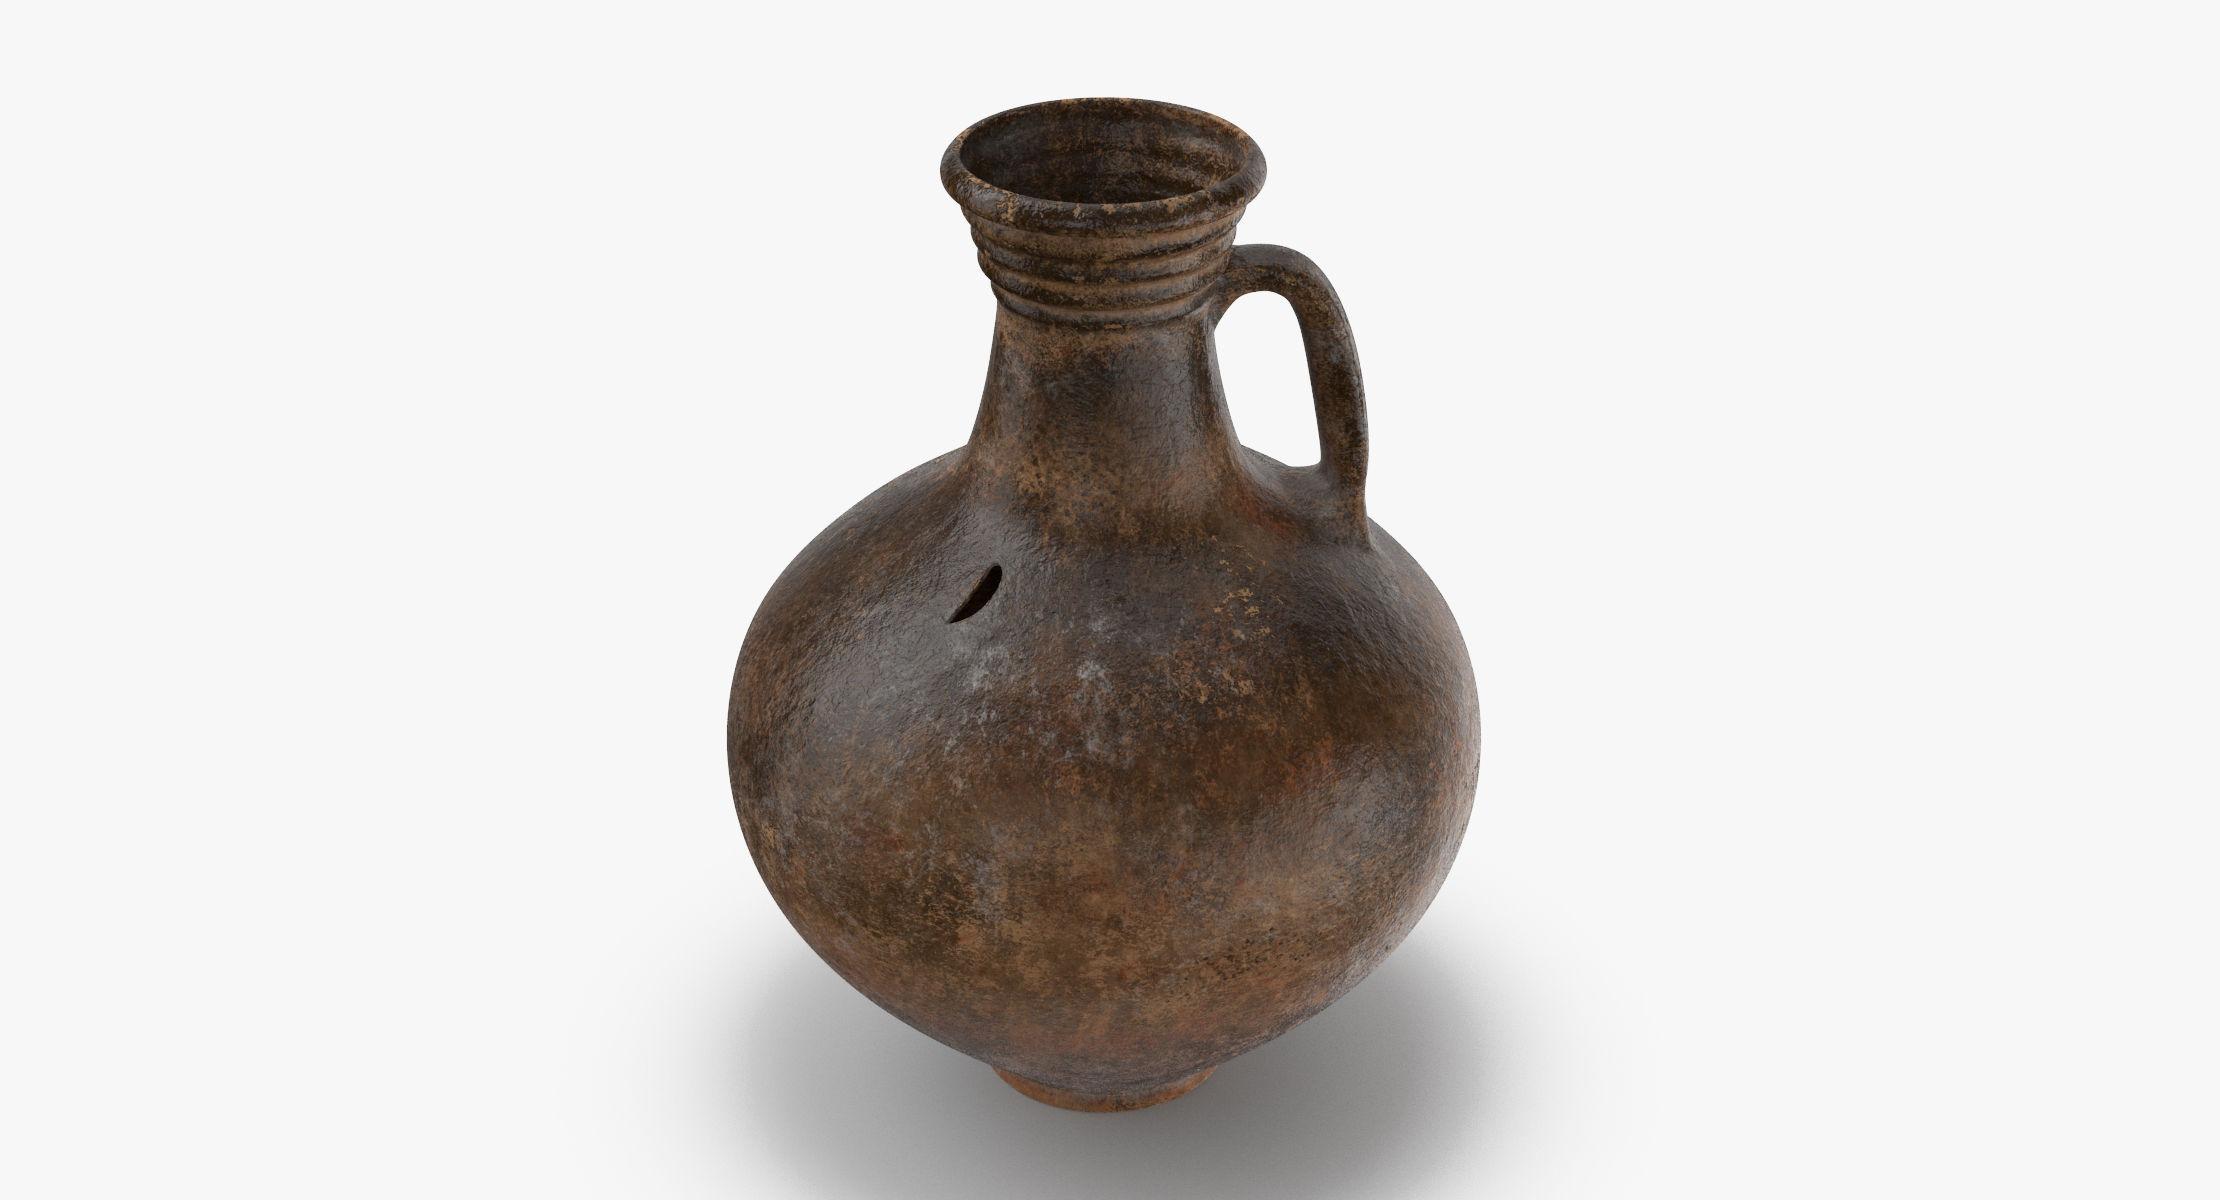 Ceramic Wine Jug 01 - reel 1